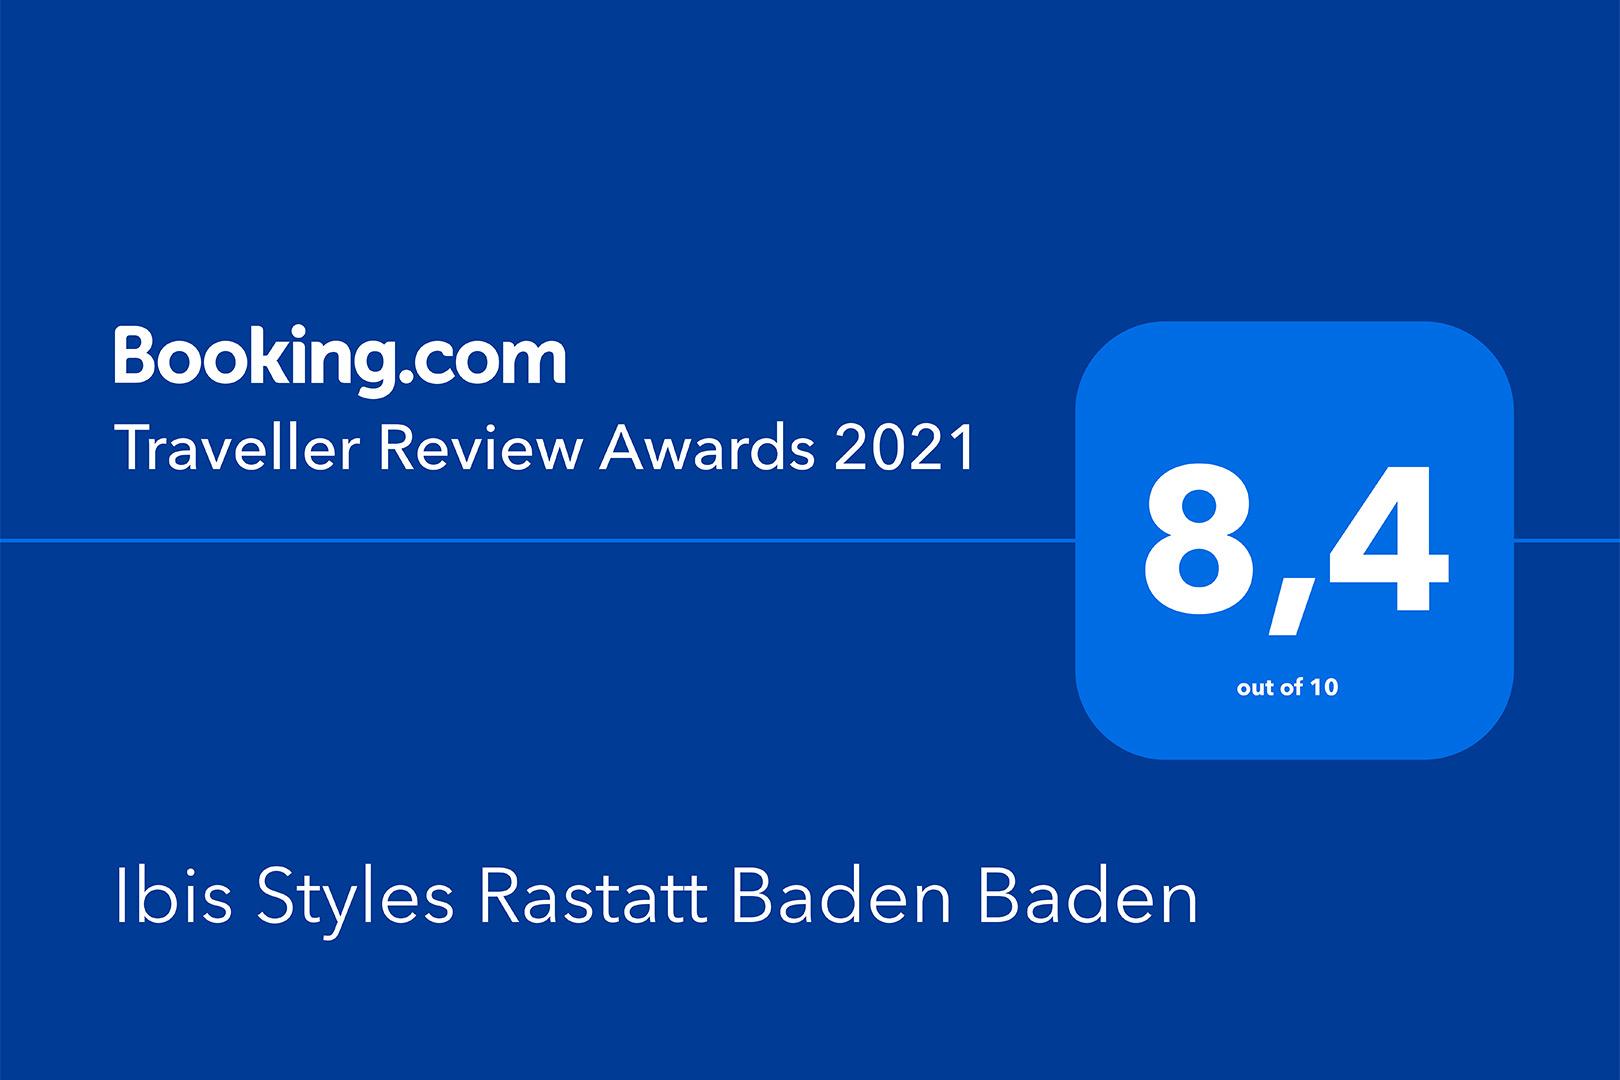 ibis Styles Rastatt Baden-Baden - Traveller Review Award 2021